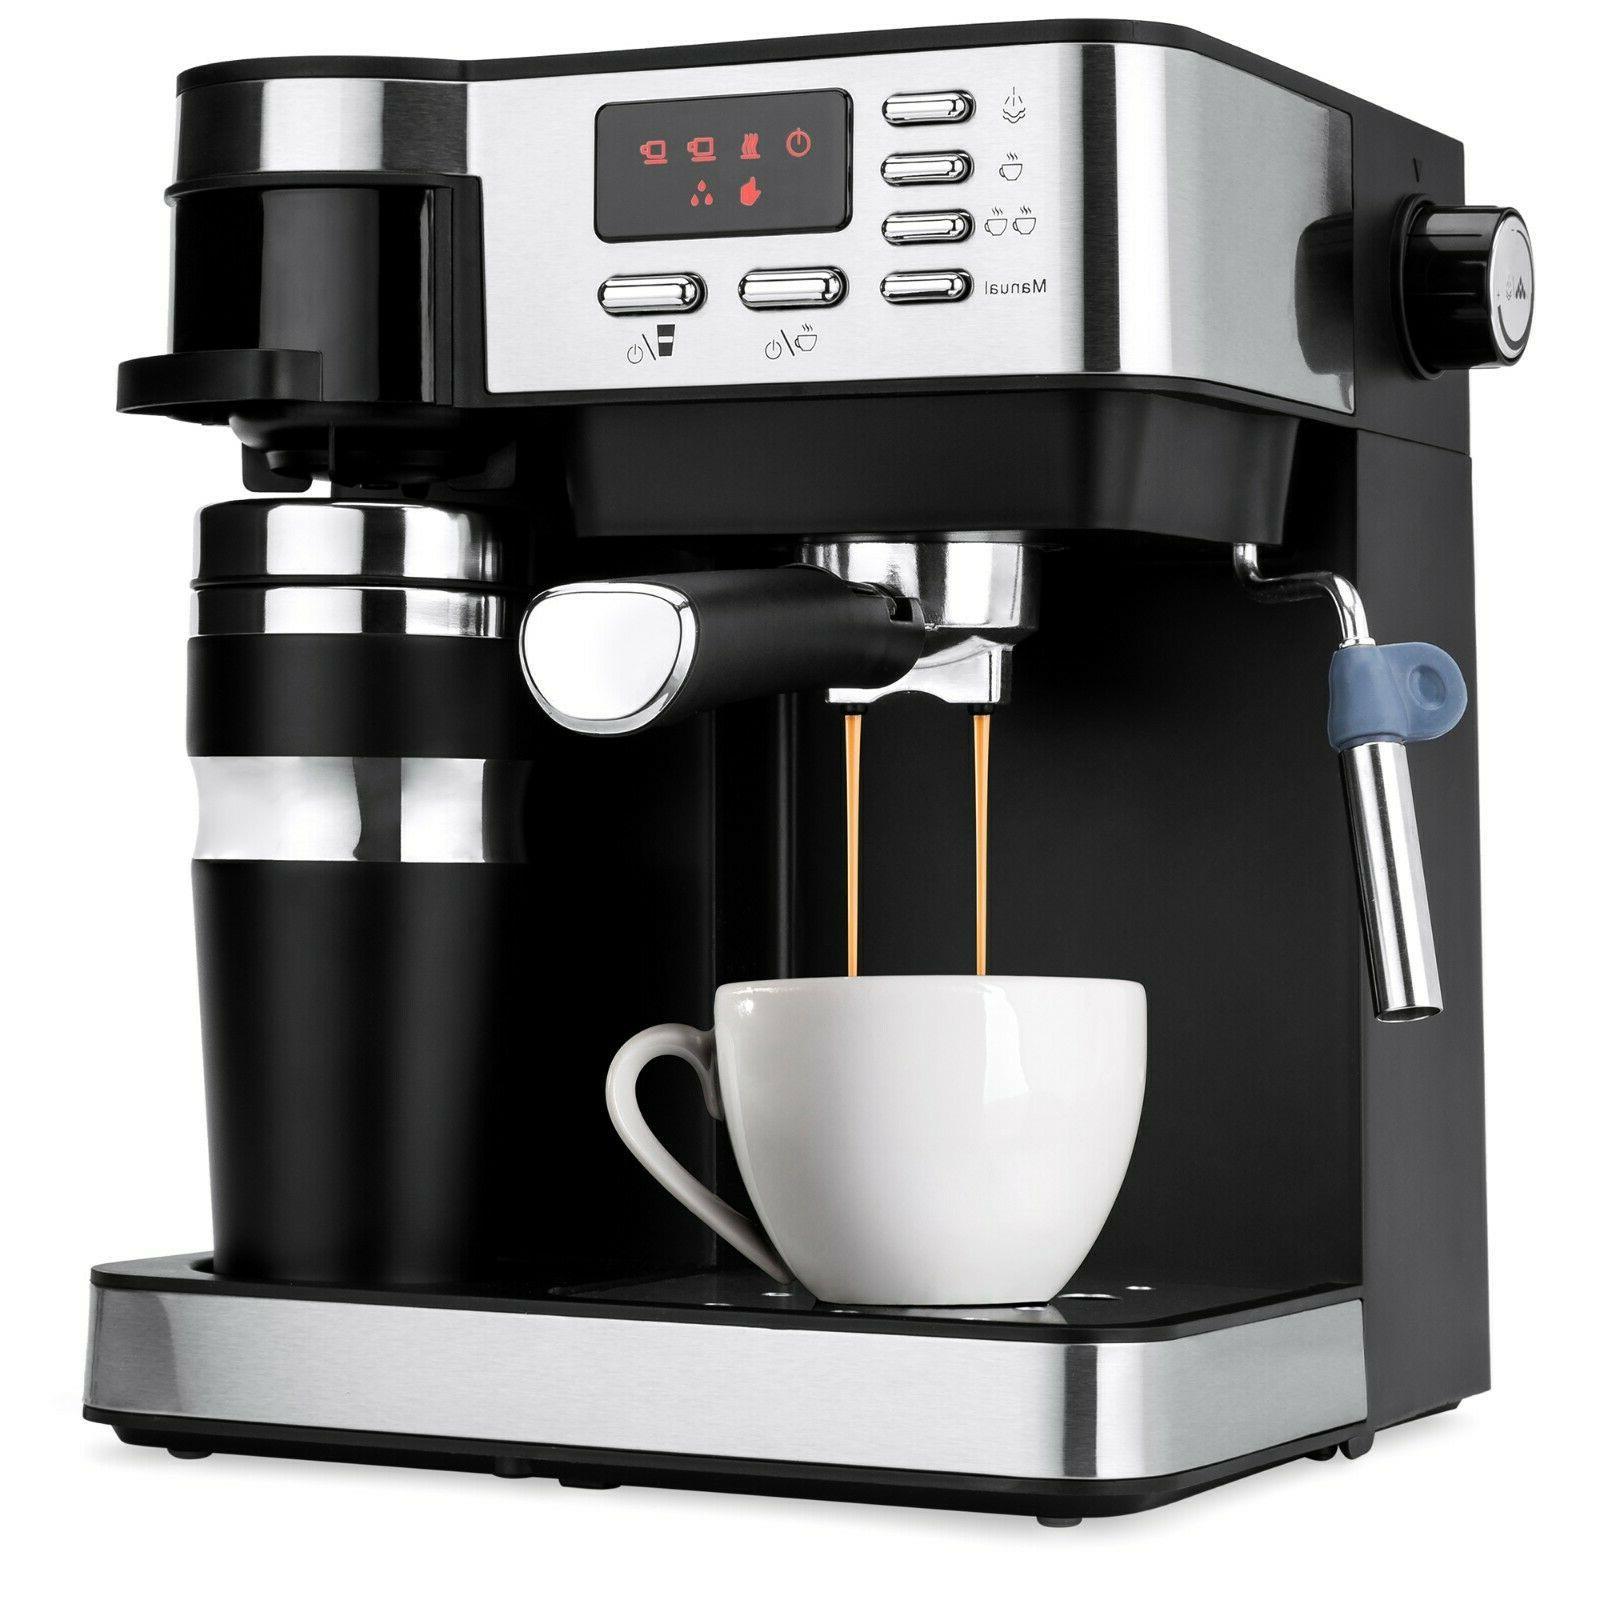 3-in-1 Drip Coffee, and Machine Choice